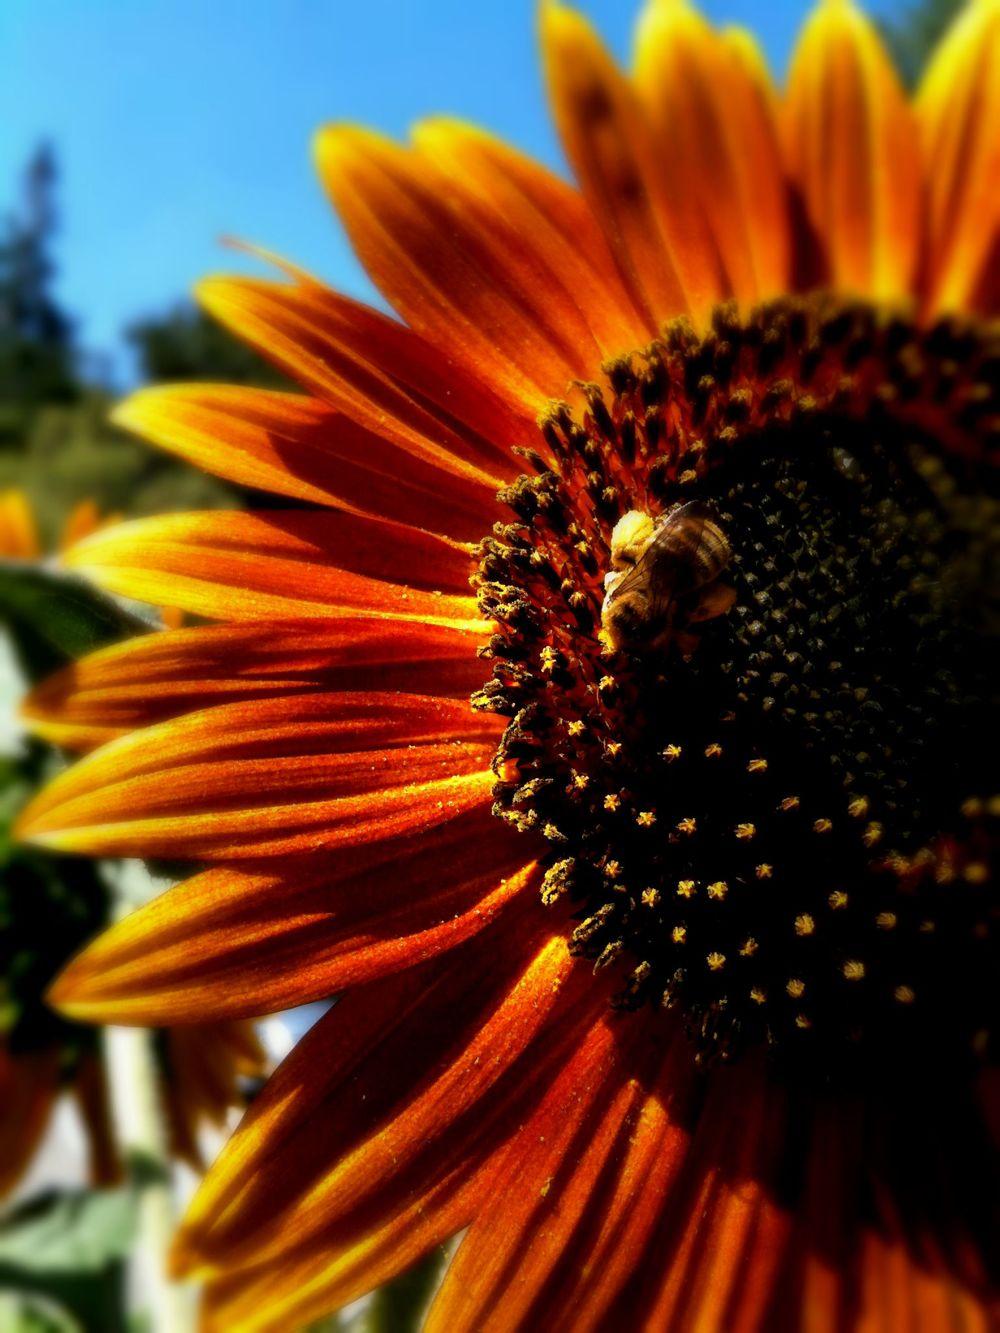 sunflower_bee.JPG